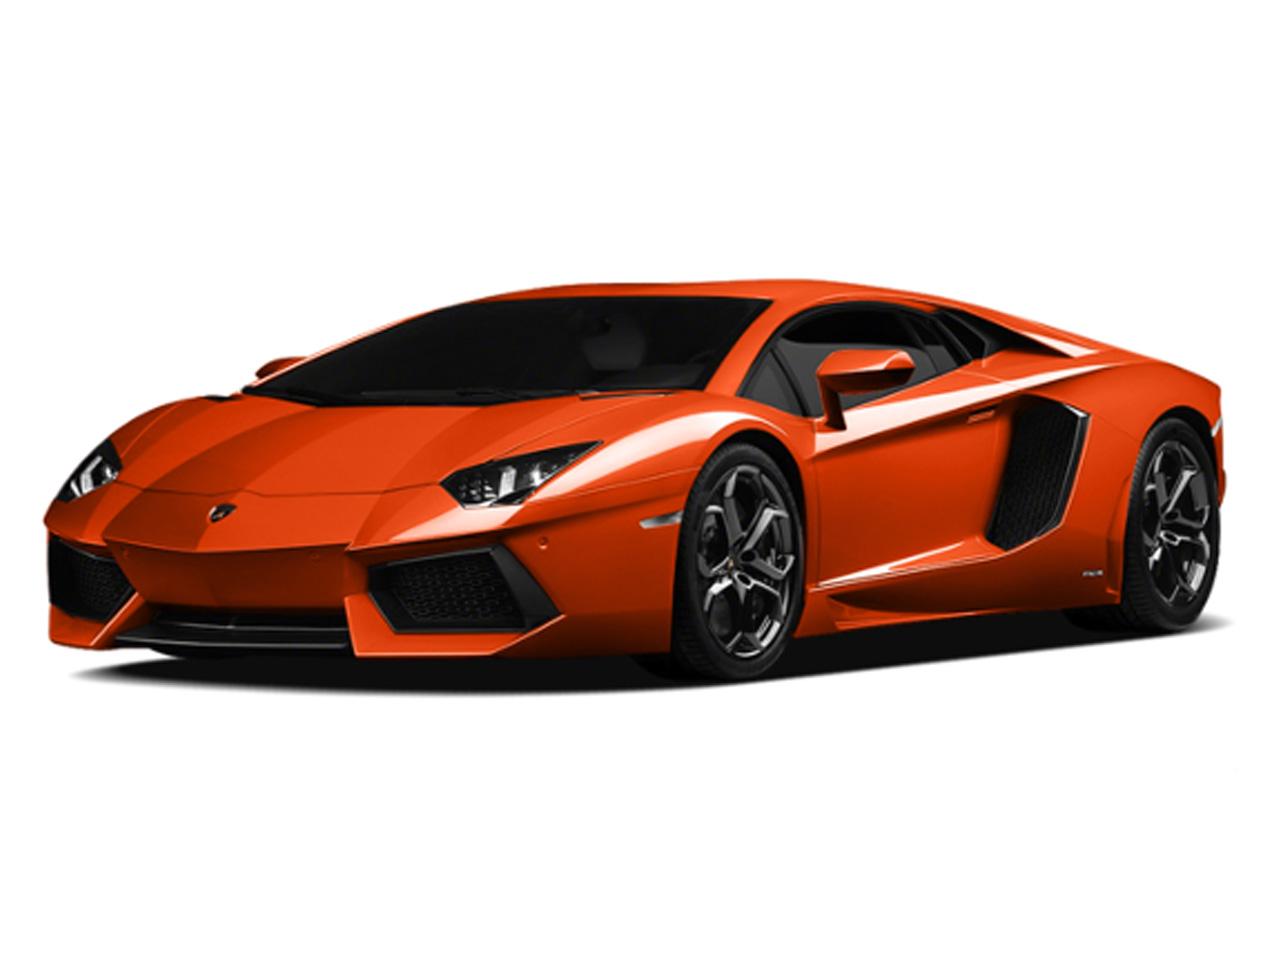 100 lamborghini sports car 2016 lamborghini hurac n 580 2 review digital trends. Black Bedroom Furniture Sets. Home Design Ideas